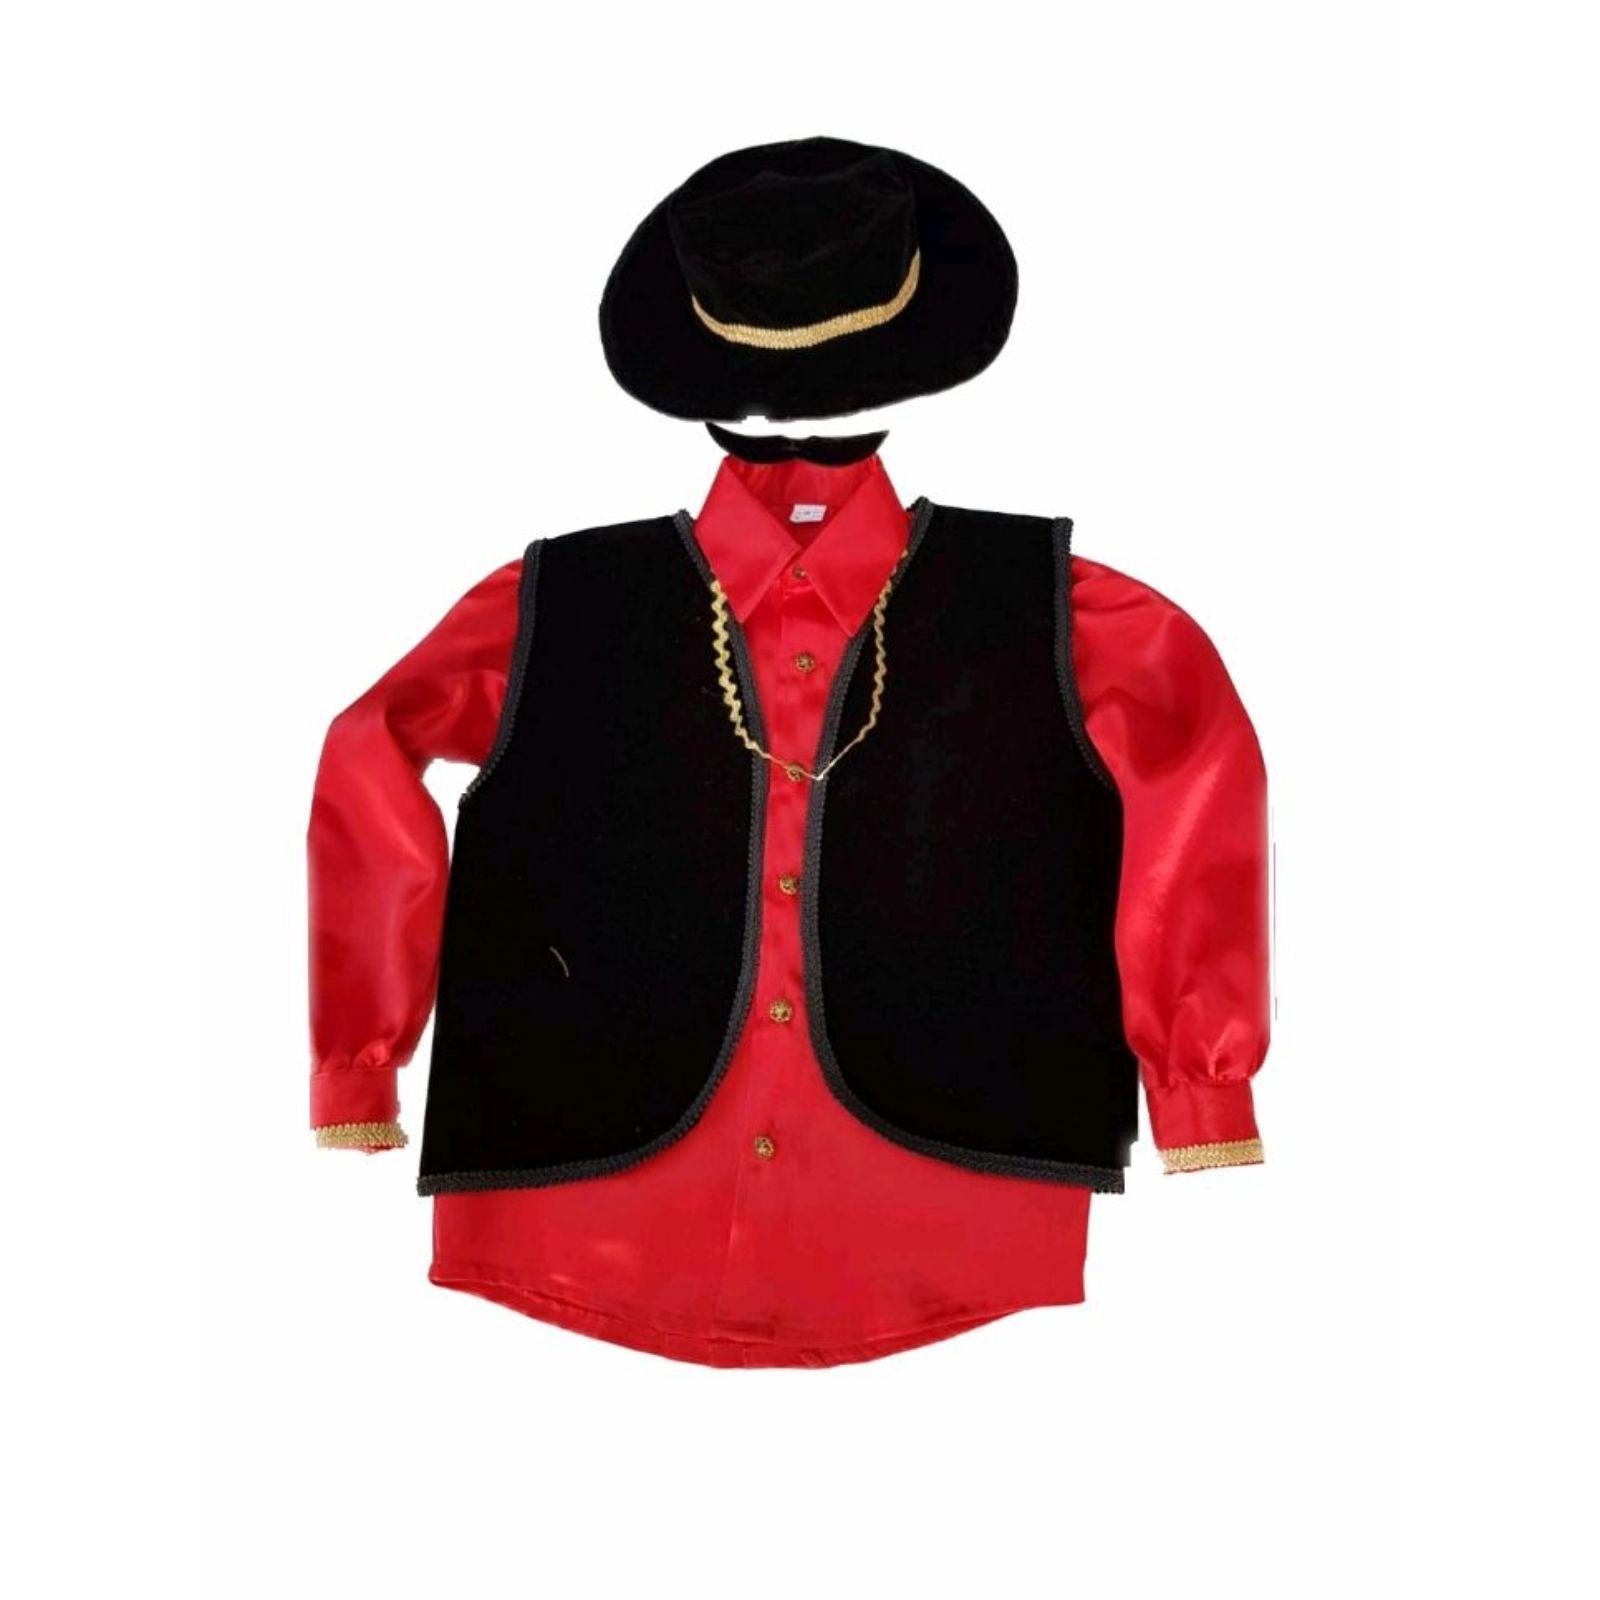 Costum țigan roșu cu vesta catifea 1